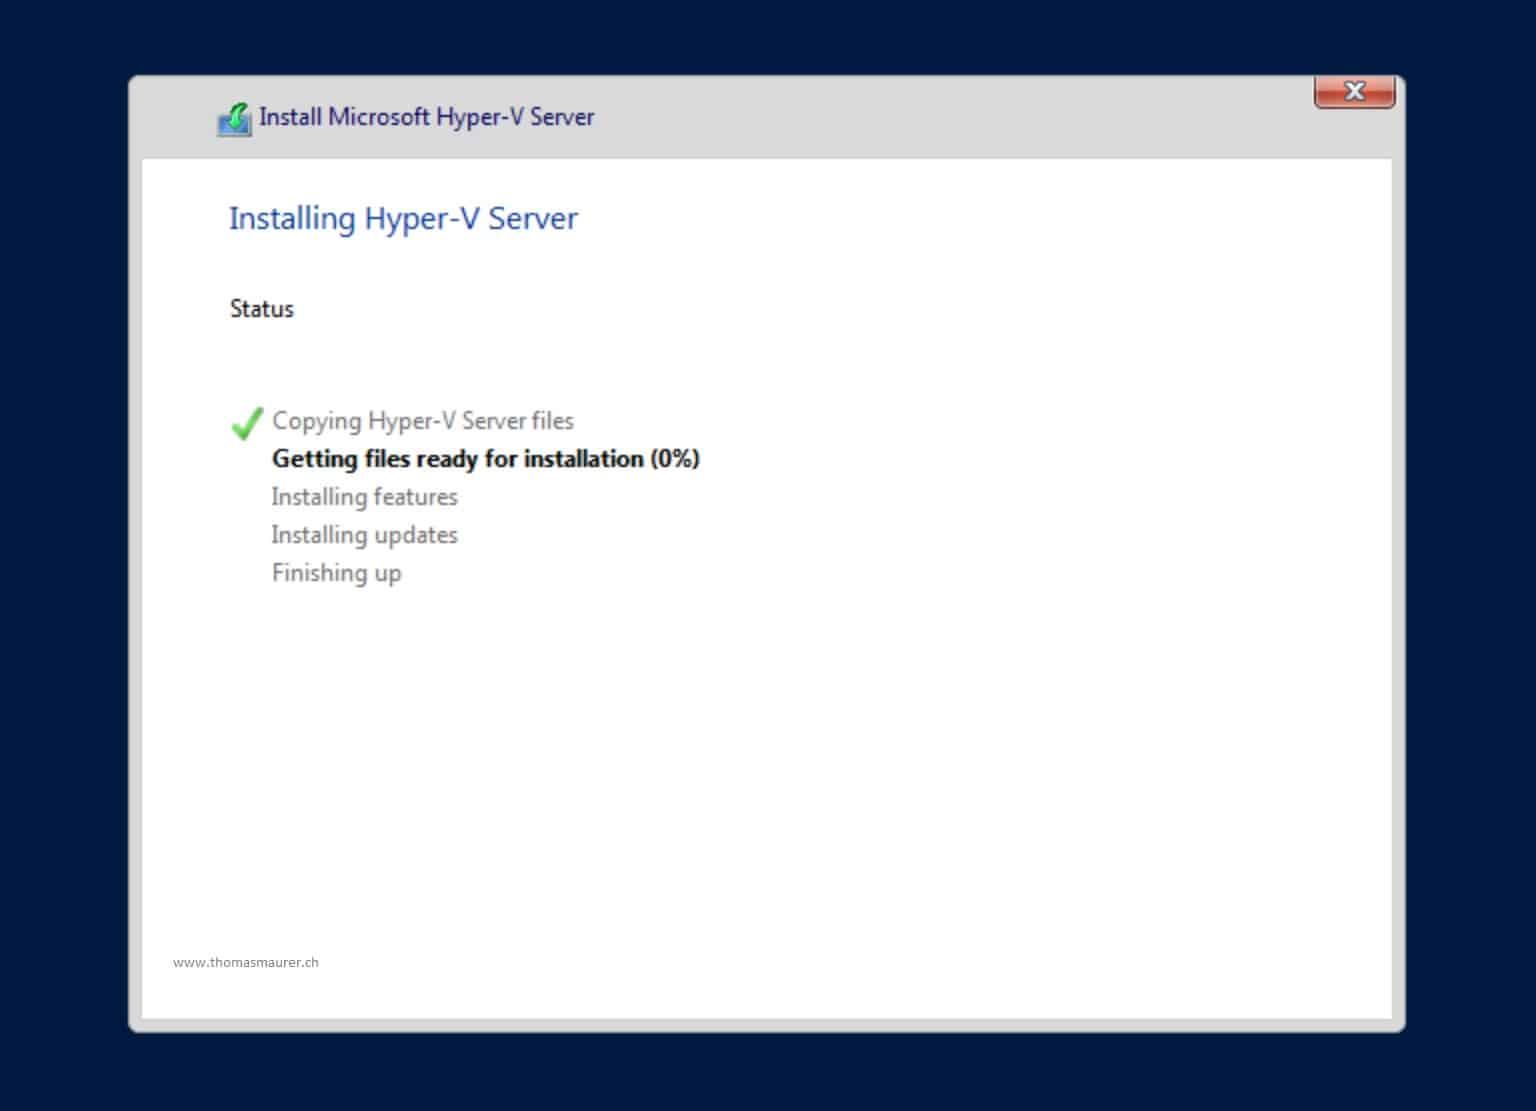 How to Install Hyper-V Server 2019 - Thomas Maurer